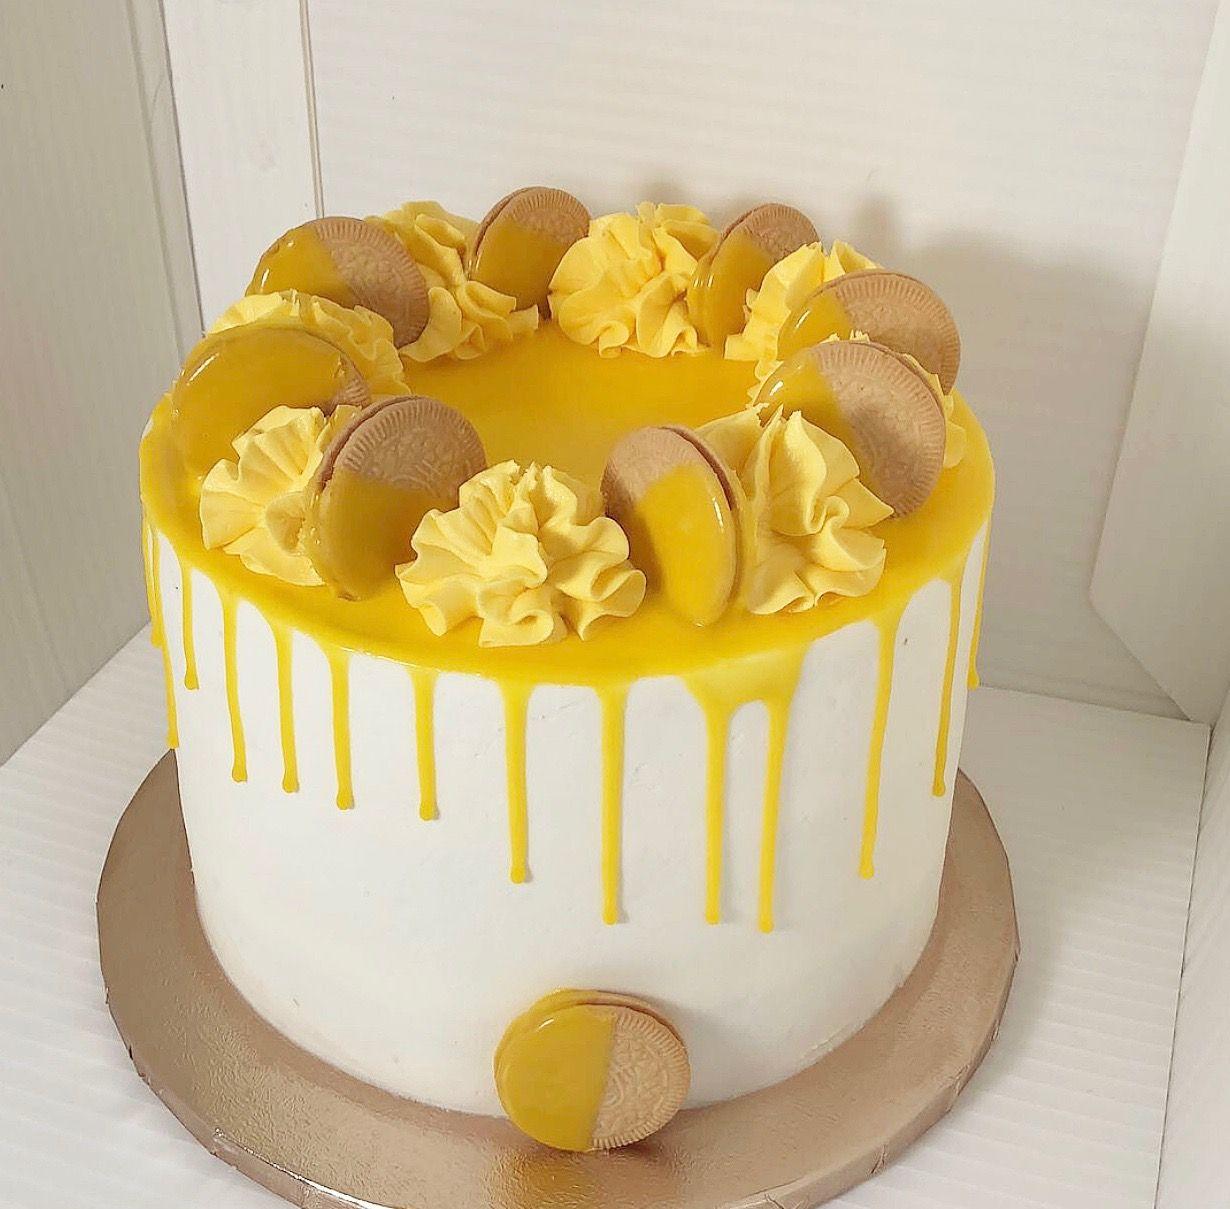 Lemon Buttercream Drip Cake Birthday Cake Lemon Birthday Cakes Birthday Cake Decorating Drip Cakes